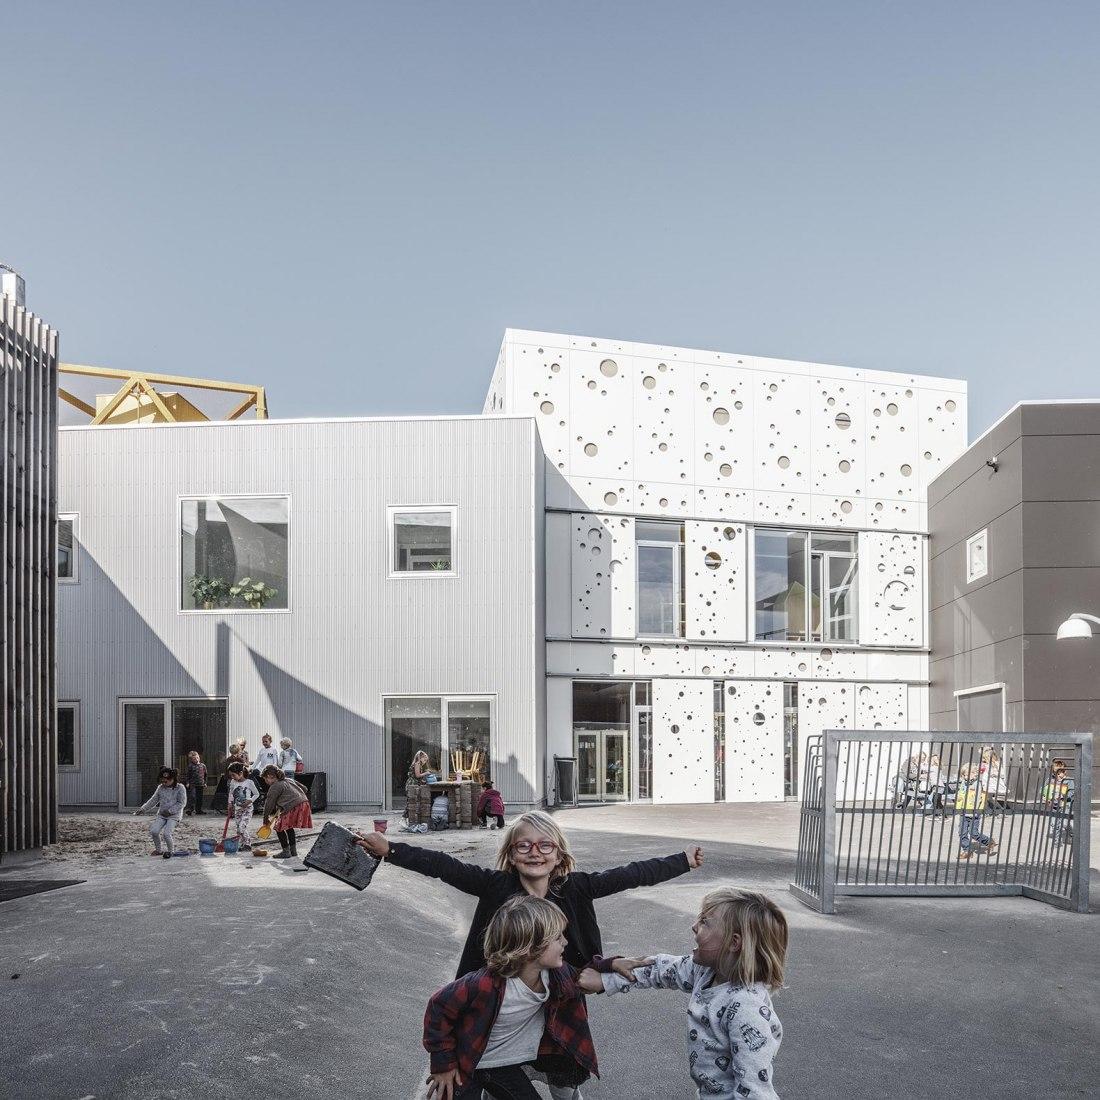 Kids' City Christianshavn by COBE and NORD Architects Copenhagen. Photograph by Rasmus Hjortshøj - COAST